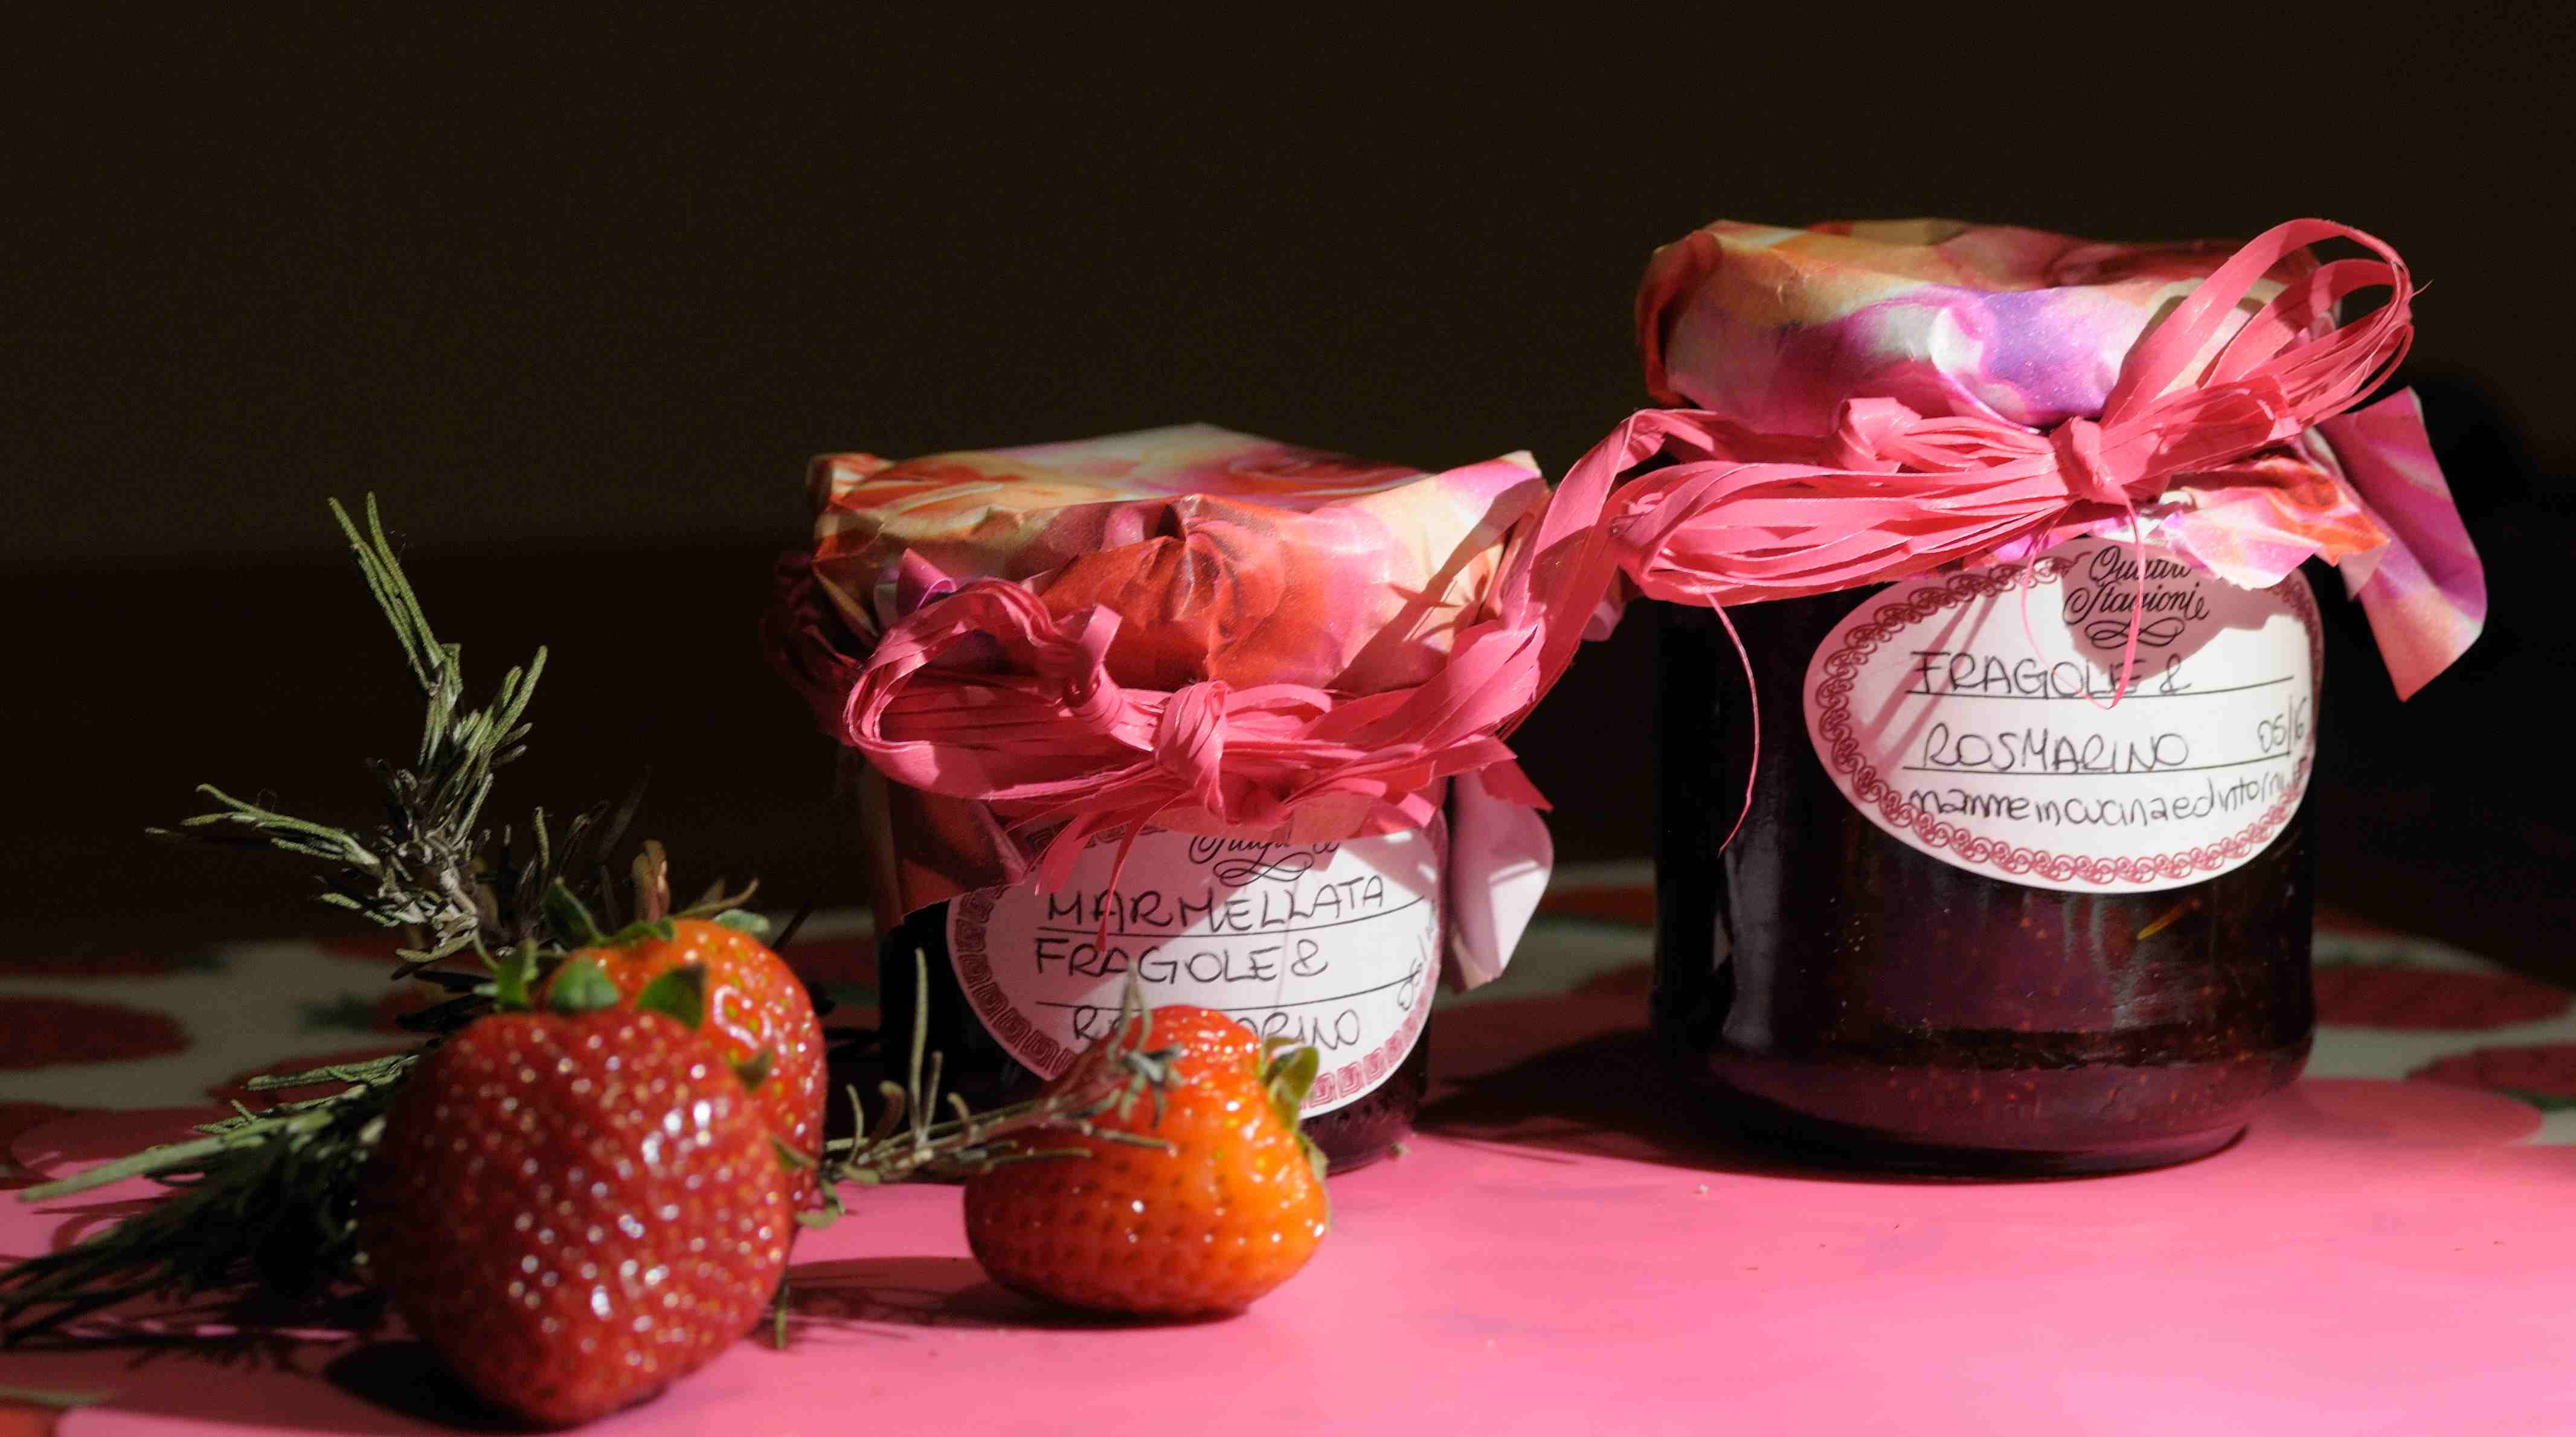 marmellata fragole e rosmarino